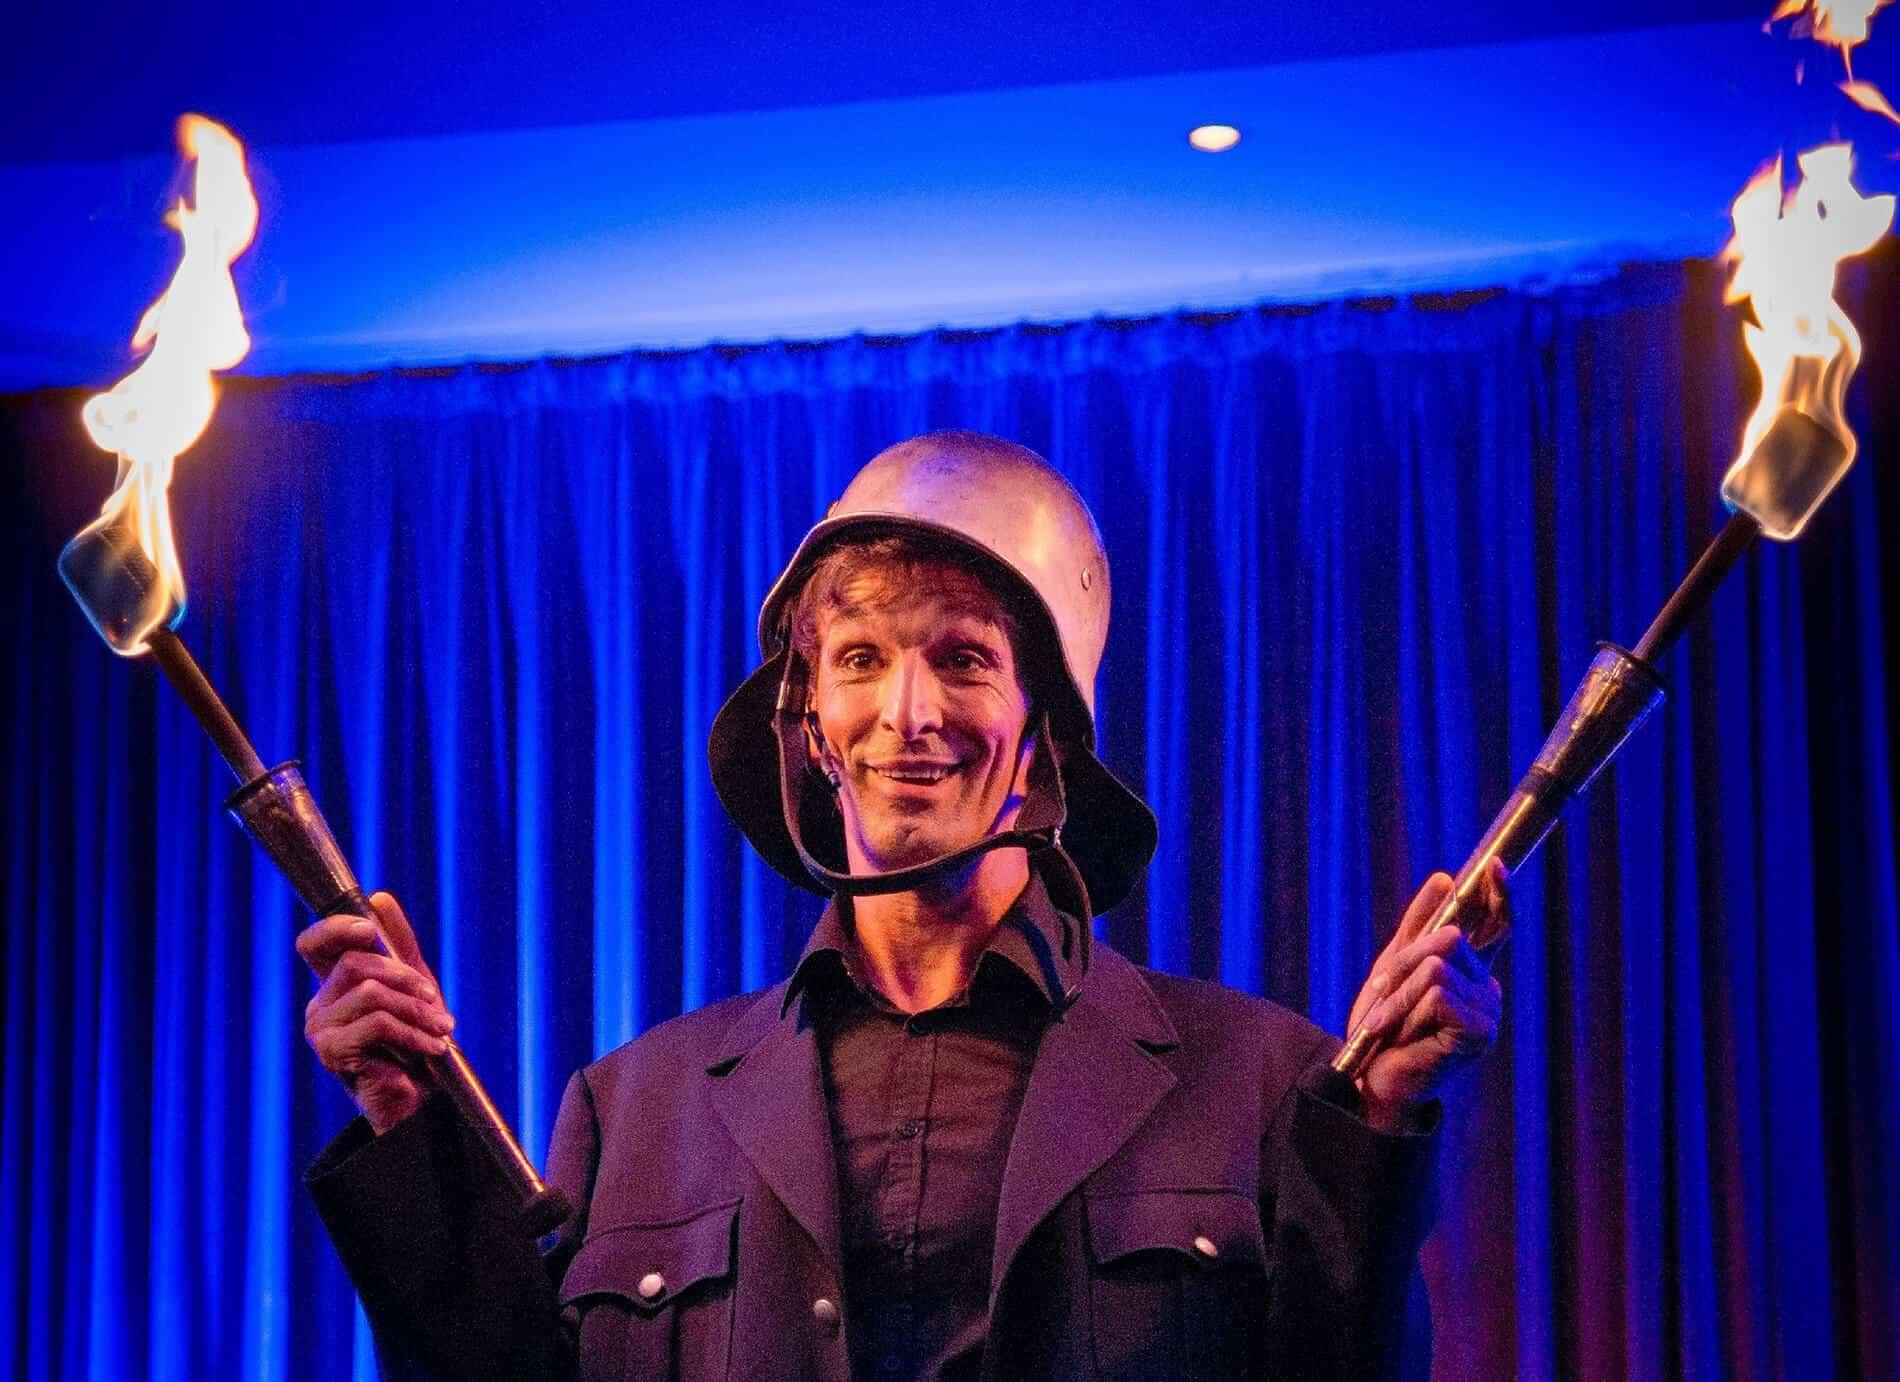 chapeau-bas-showact-artistik-und-comedy-11